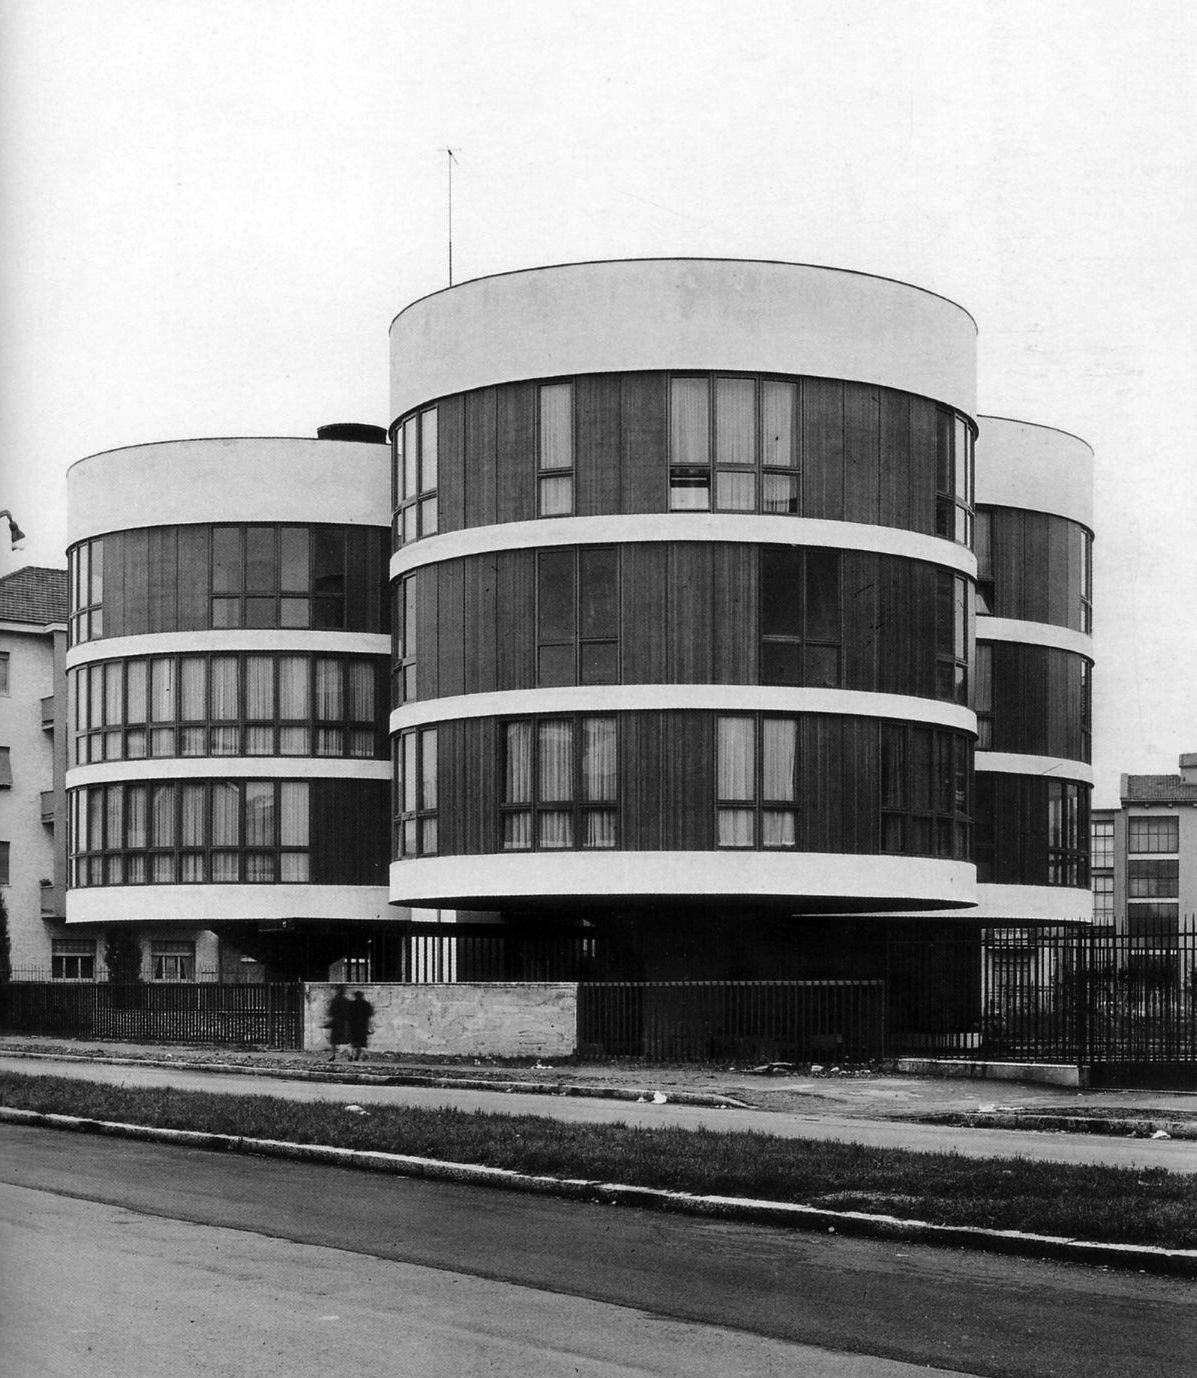 mangiarotti morassutti 1959 1962 arc housing pinterest architektur. Black Bedroom Furniture Sets. Home Design Ideas